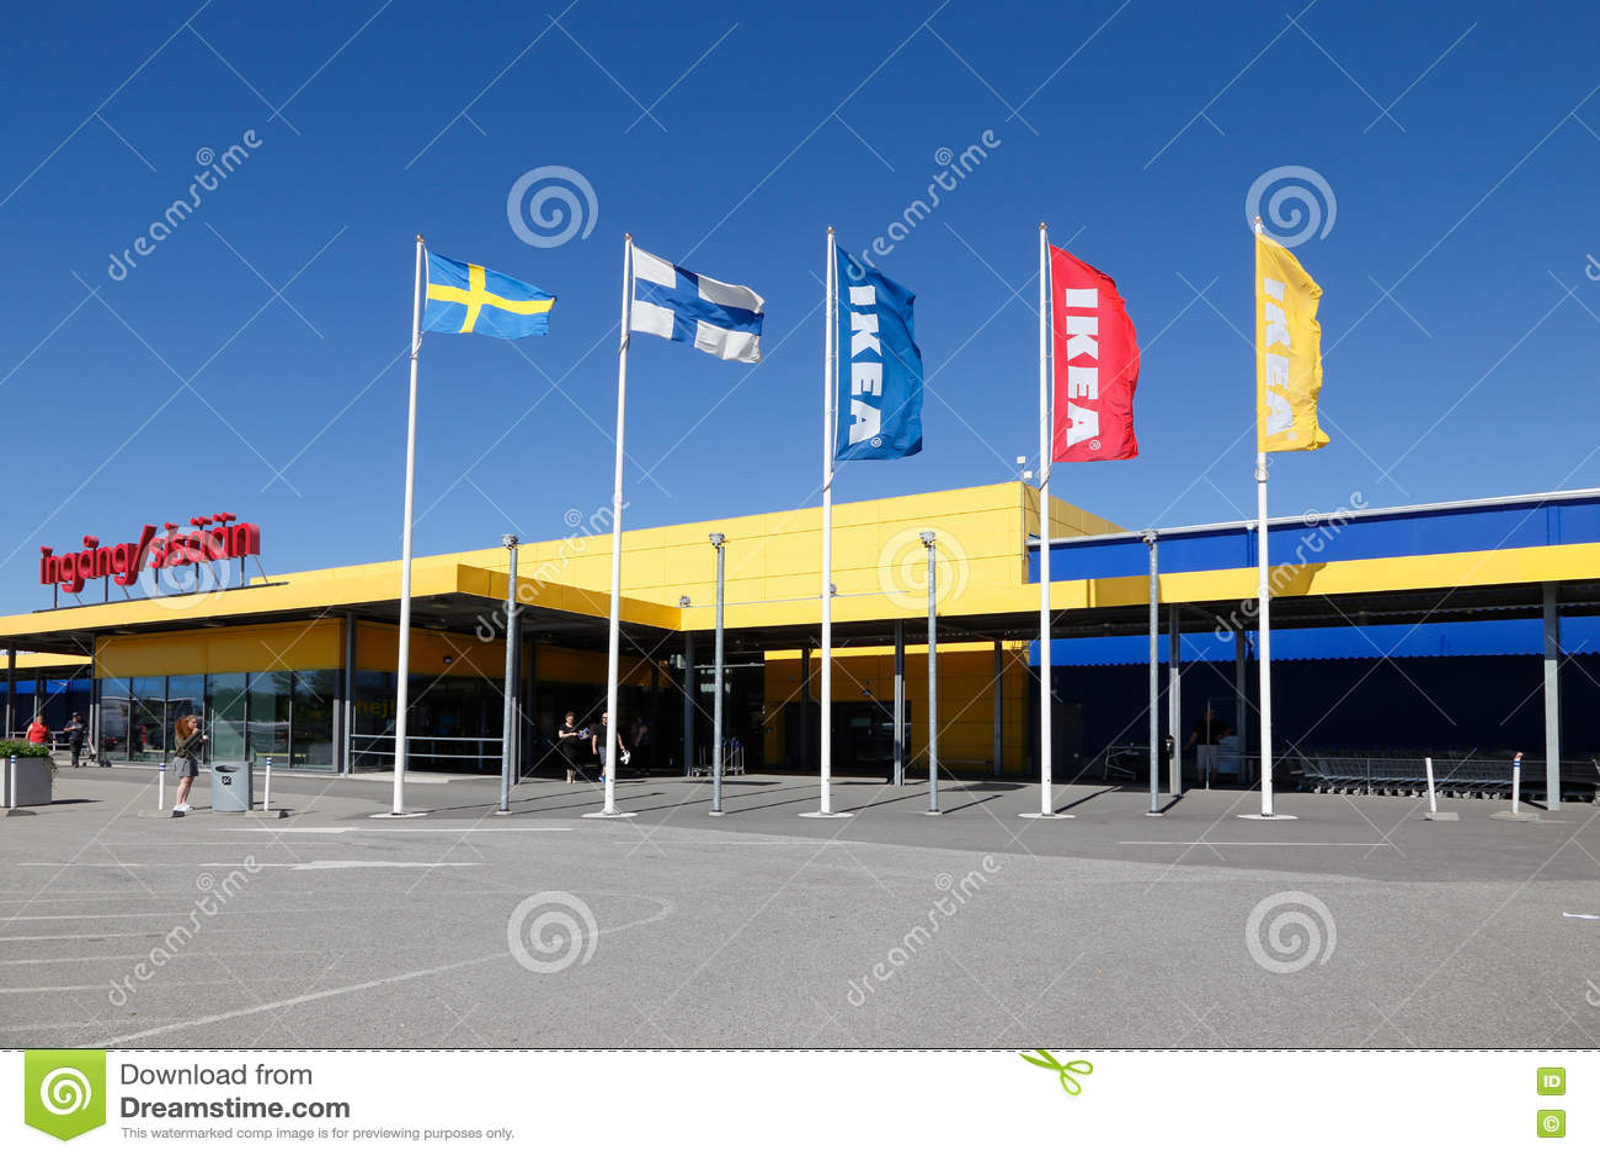 Ikea Haparanda Exterior Editorial Image Image 75594525